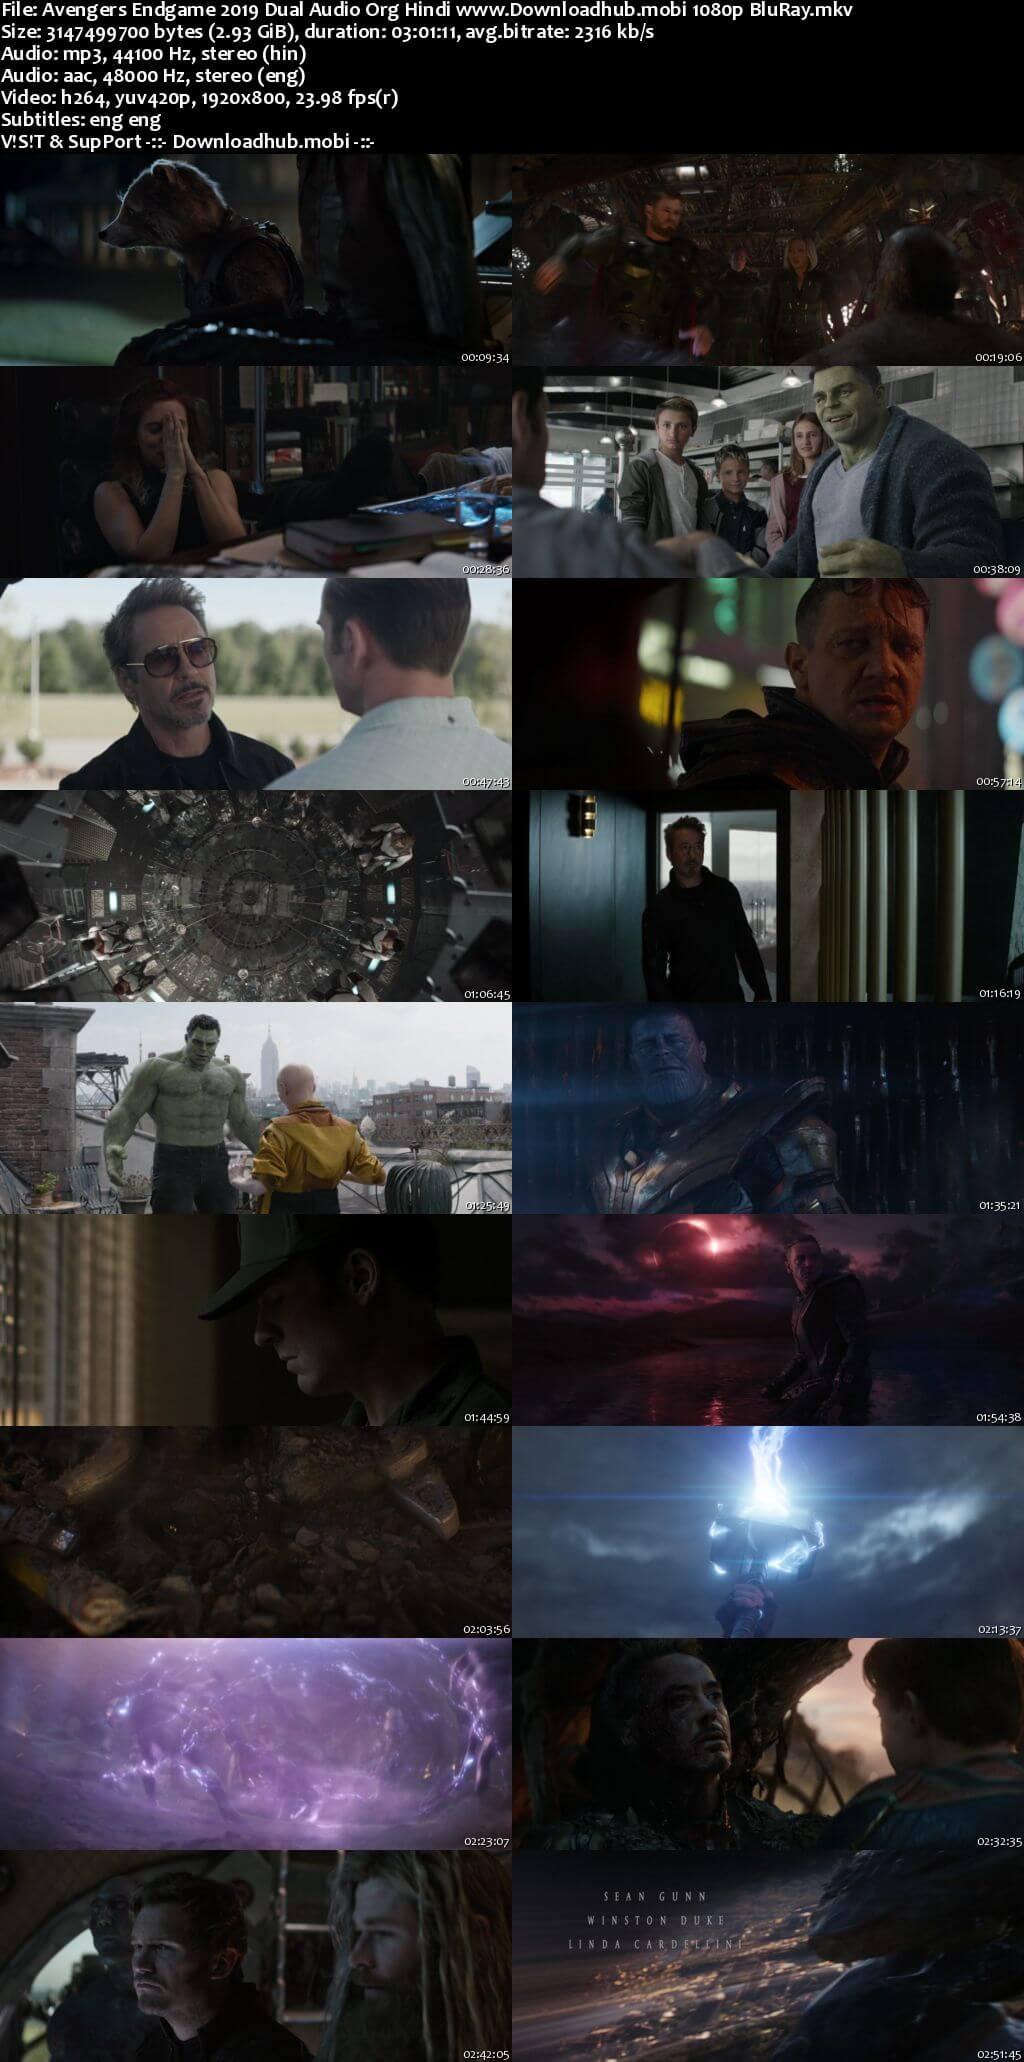 Avengers Endgame 2019 Hindi ORG Dual Audio 1080p BluRay ESubs